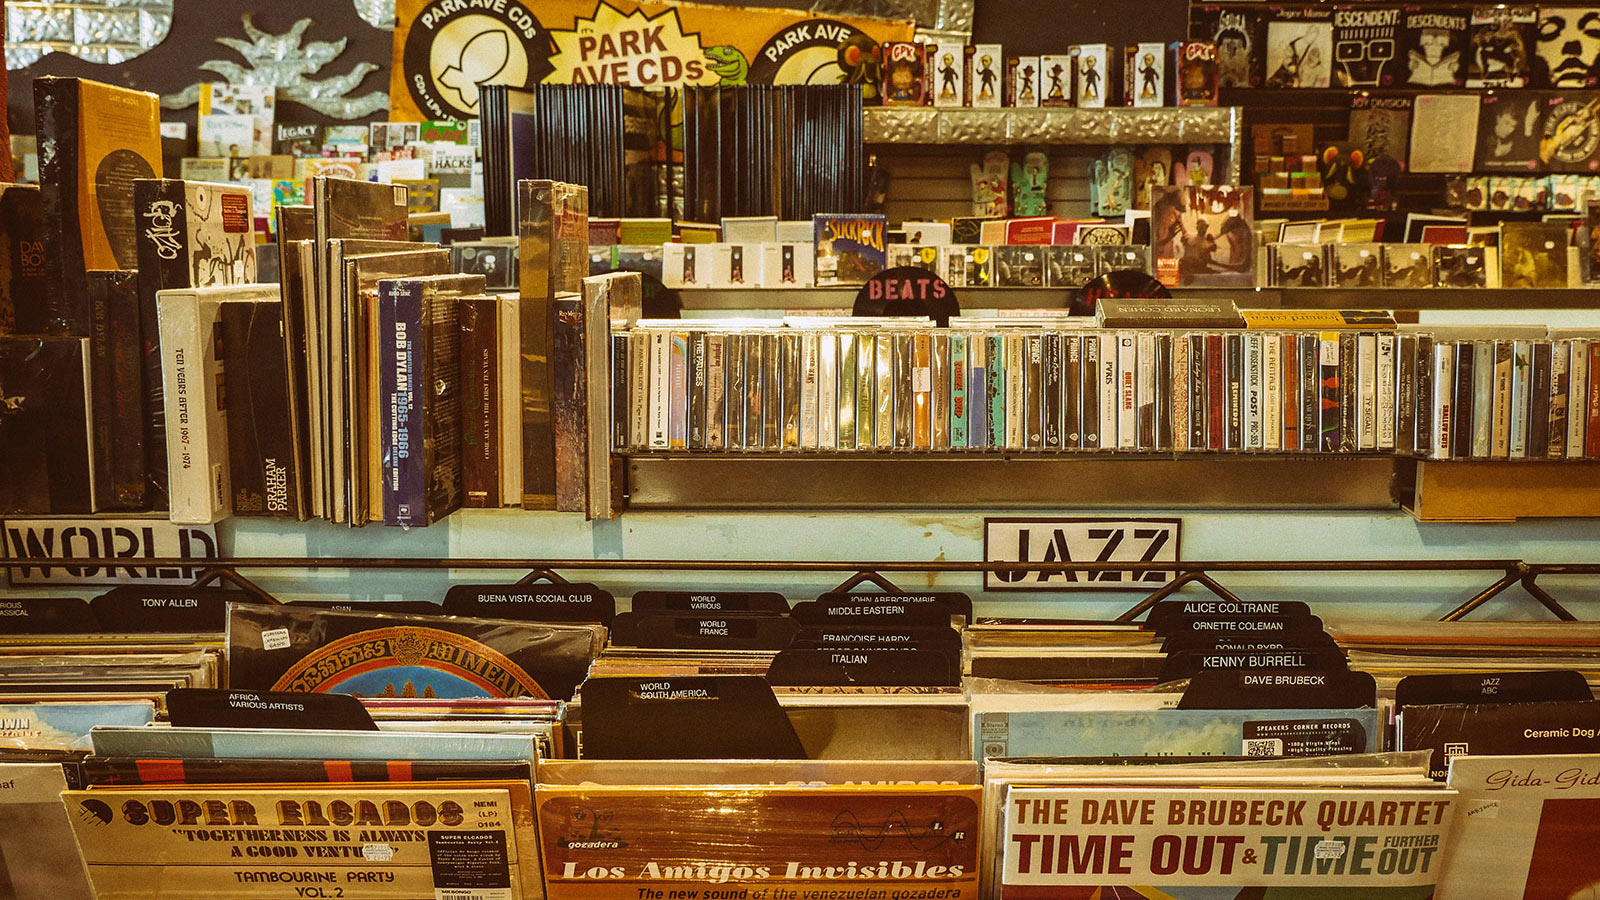 SP-404MKII | Record shop